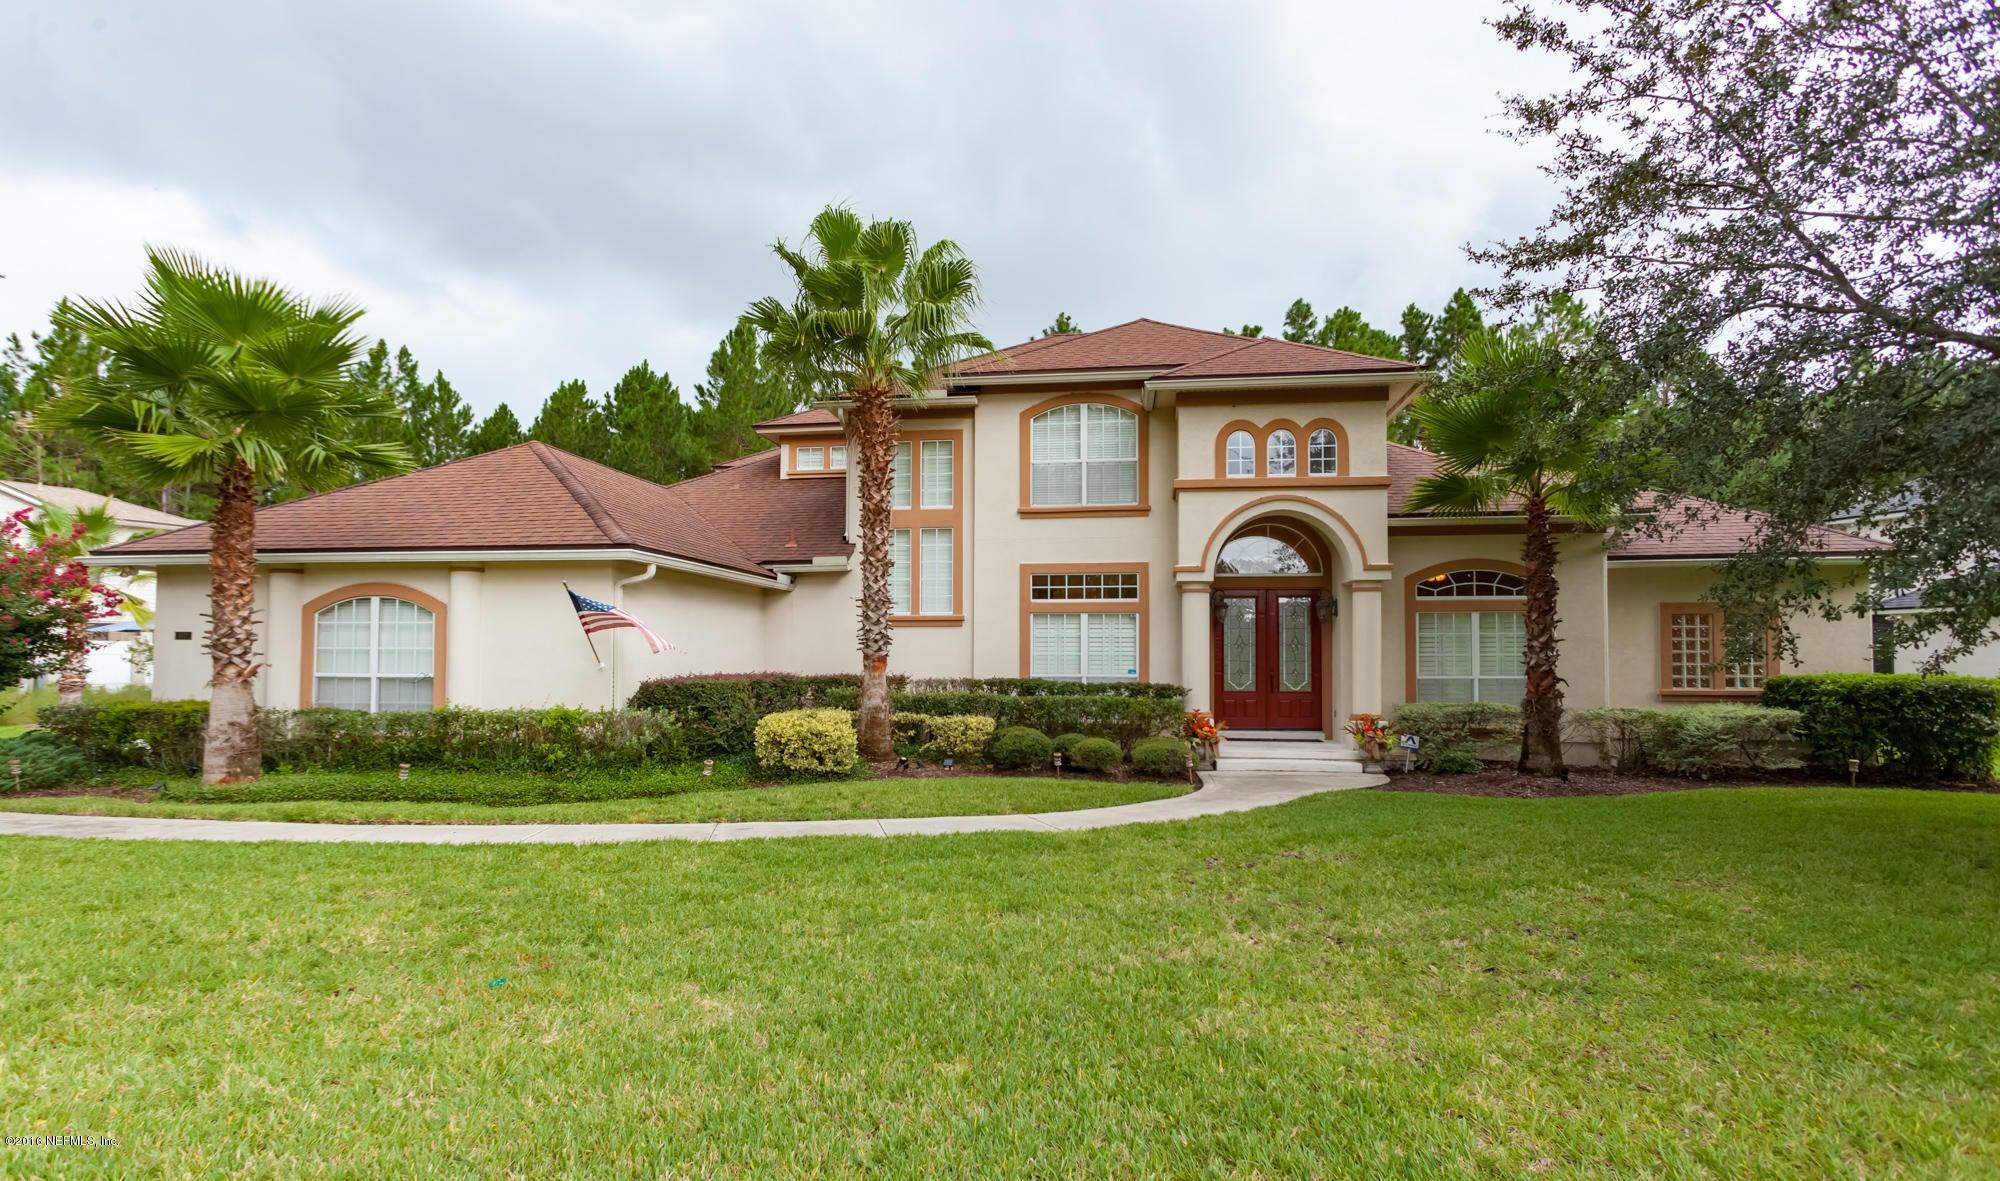 4072 EAGLE LANDING,ORANGE PARK,FLORIDA 32065,4 Bedrooms Bedrooms,3 BathroomsBathrooms,Residential - single family,EAGLE LANDING,846060